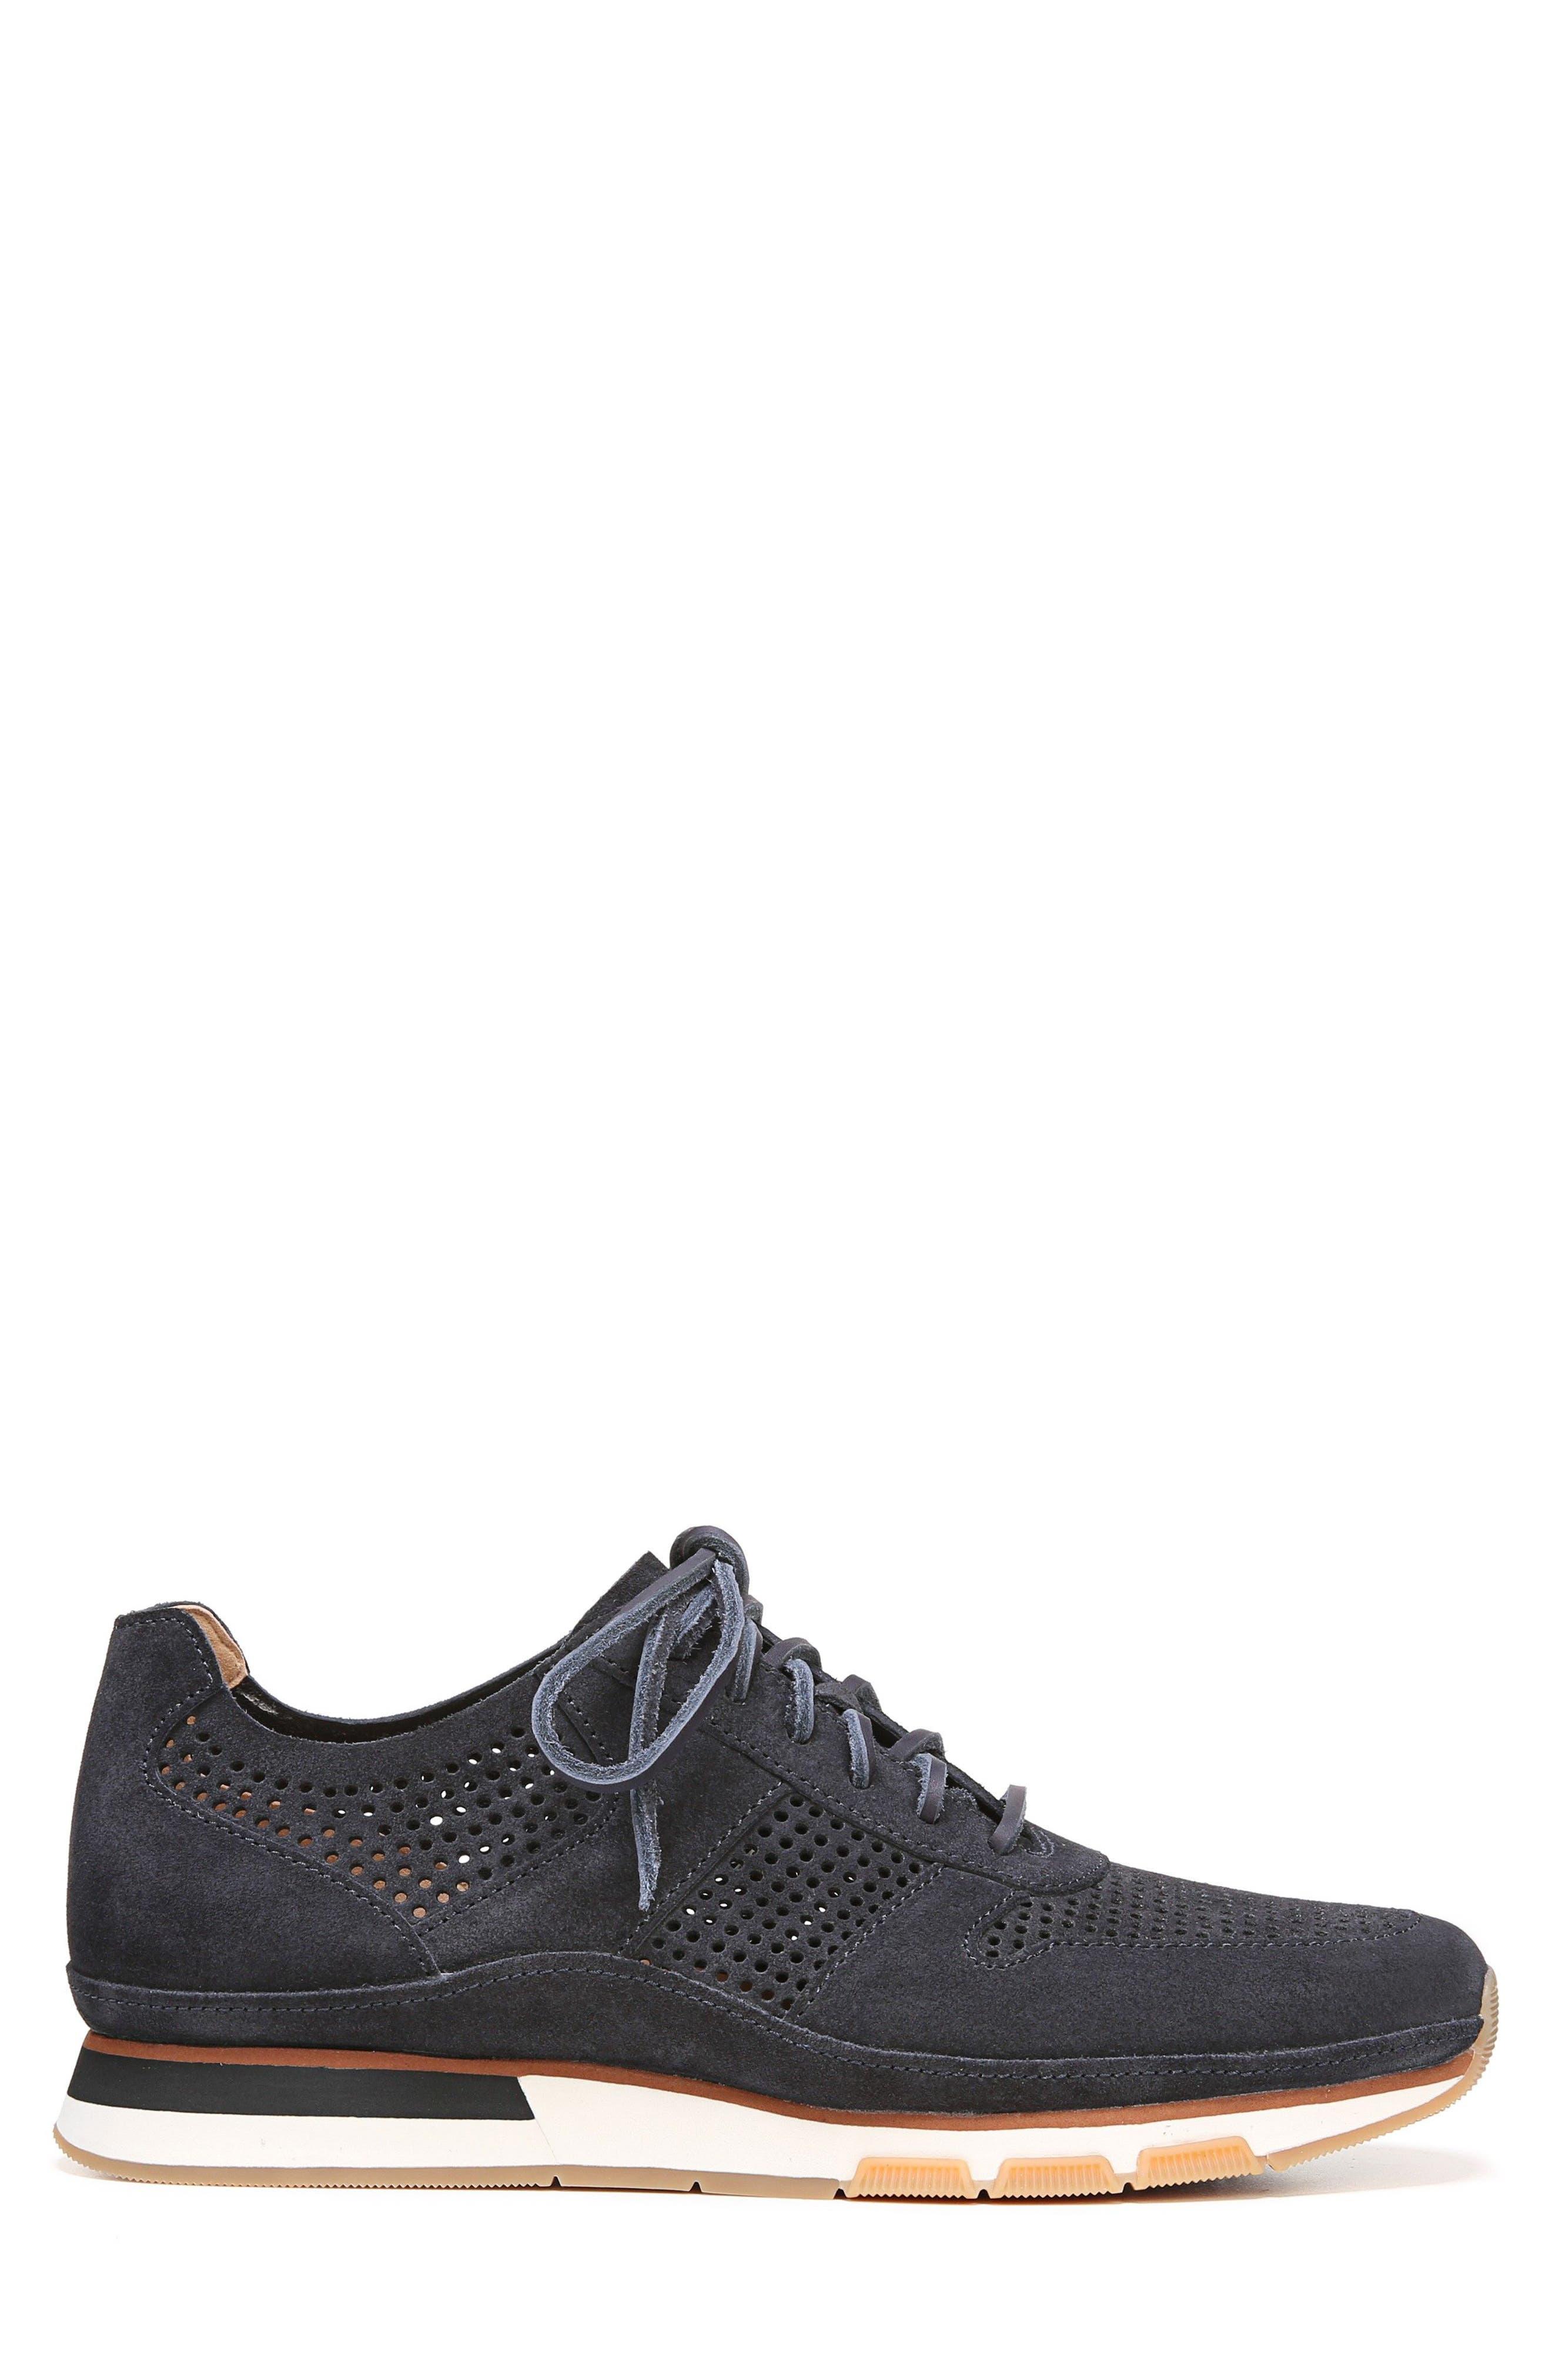 Larson Perforated Sneaker,                             Alternate thumbnail 3, color,                             COASTAL